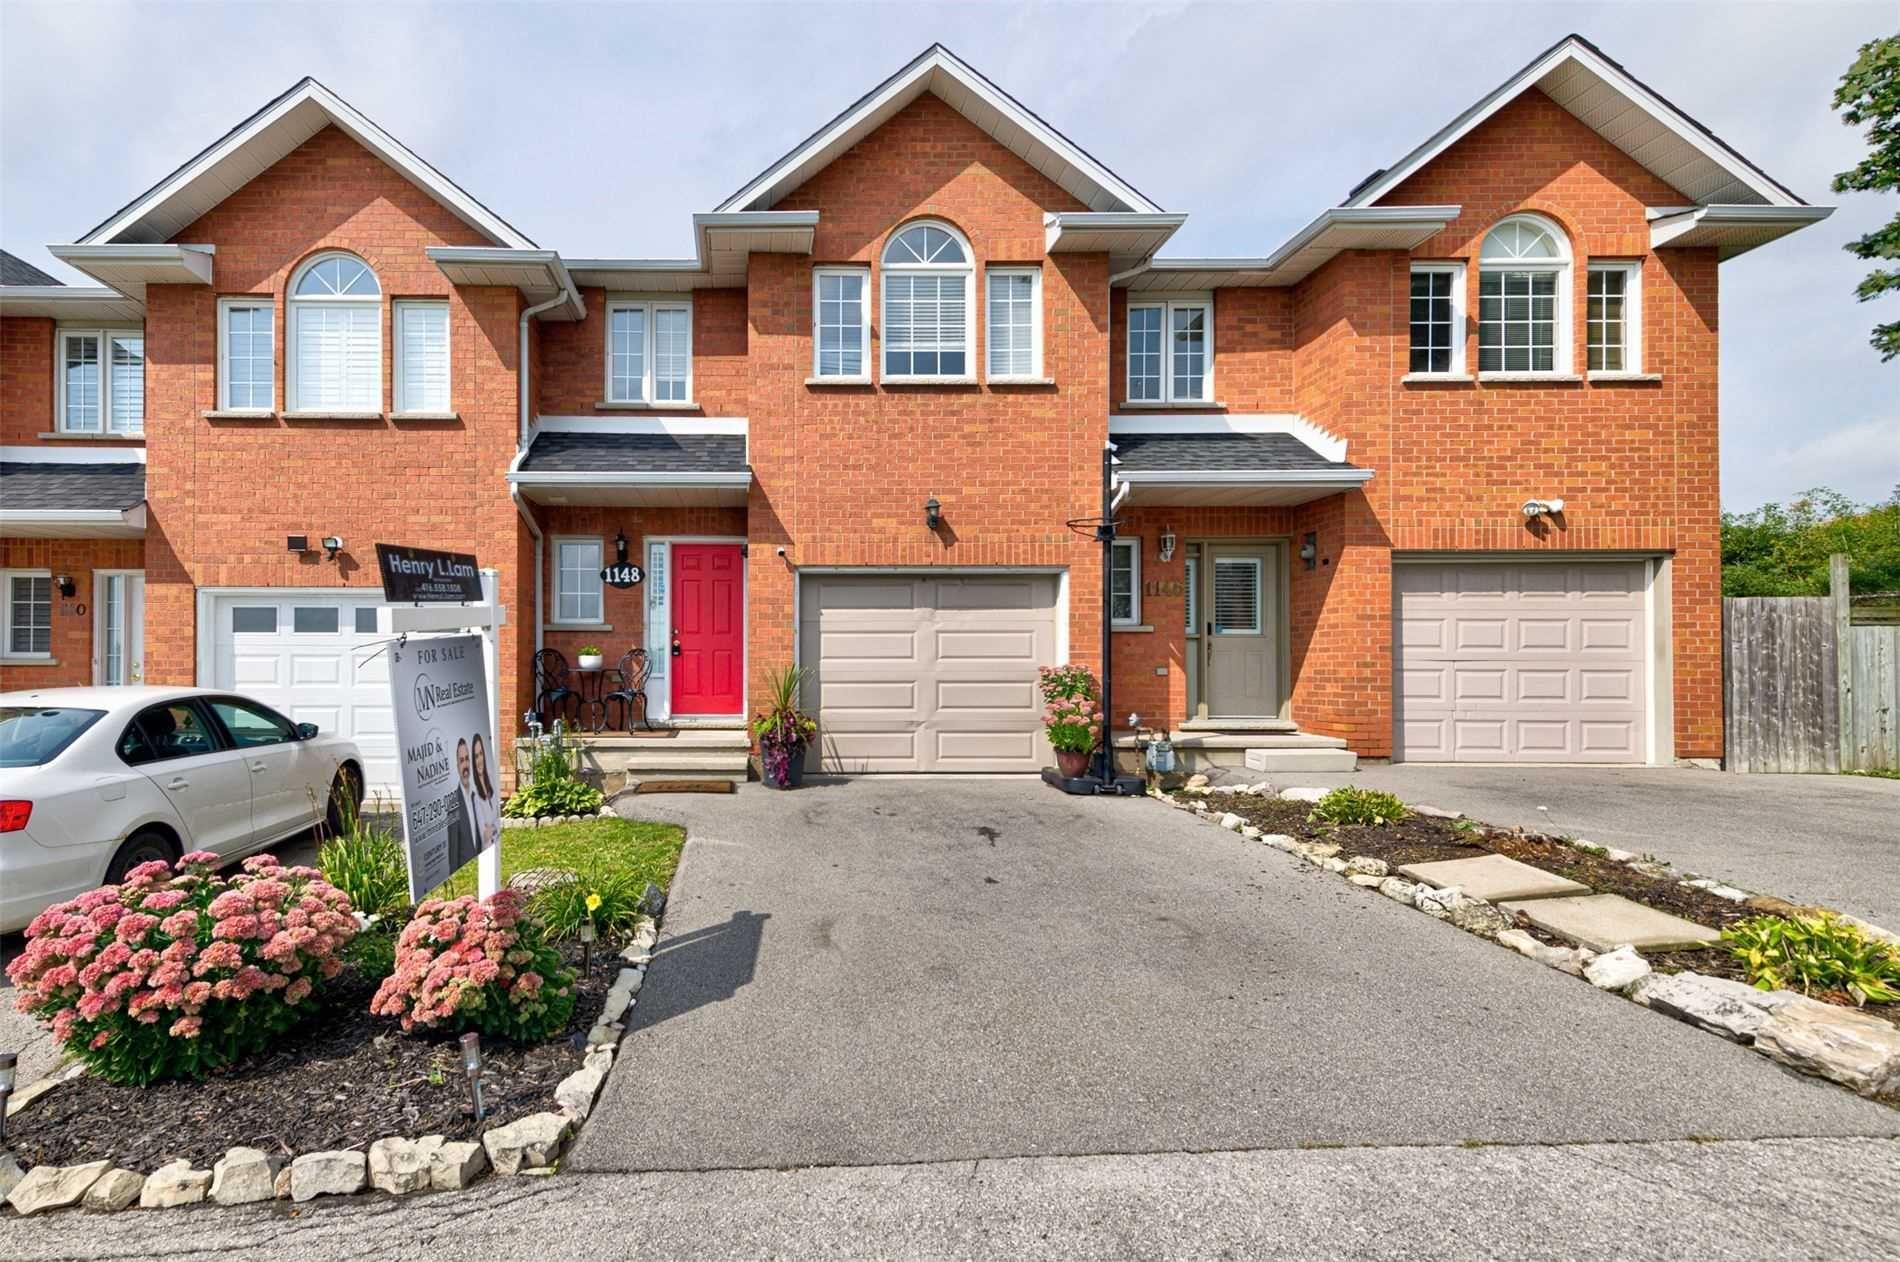 Main Photo: 1148 Upper Wentworth Street in Hamilton: Crerar House (2-Storey) for sale : MLS®# X5371936